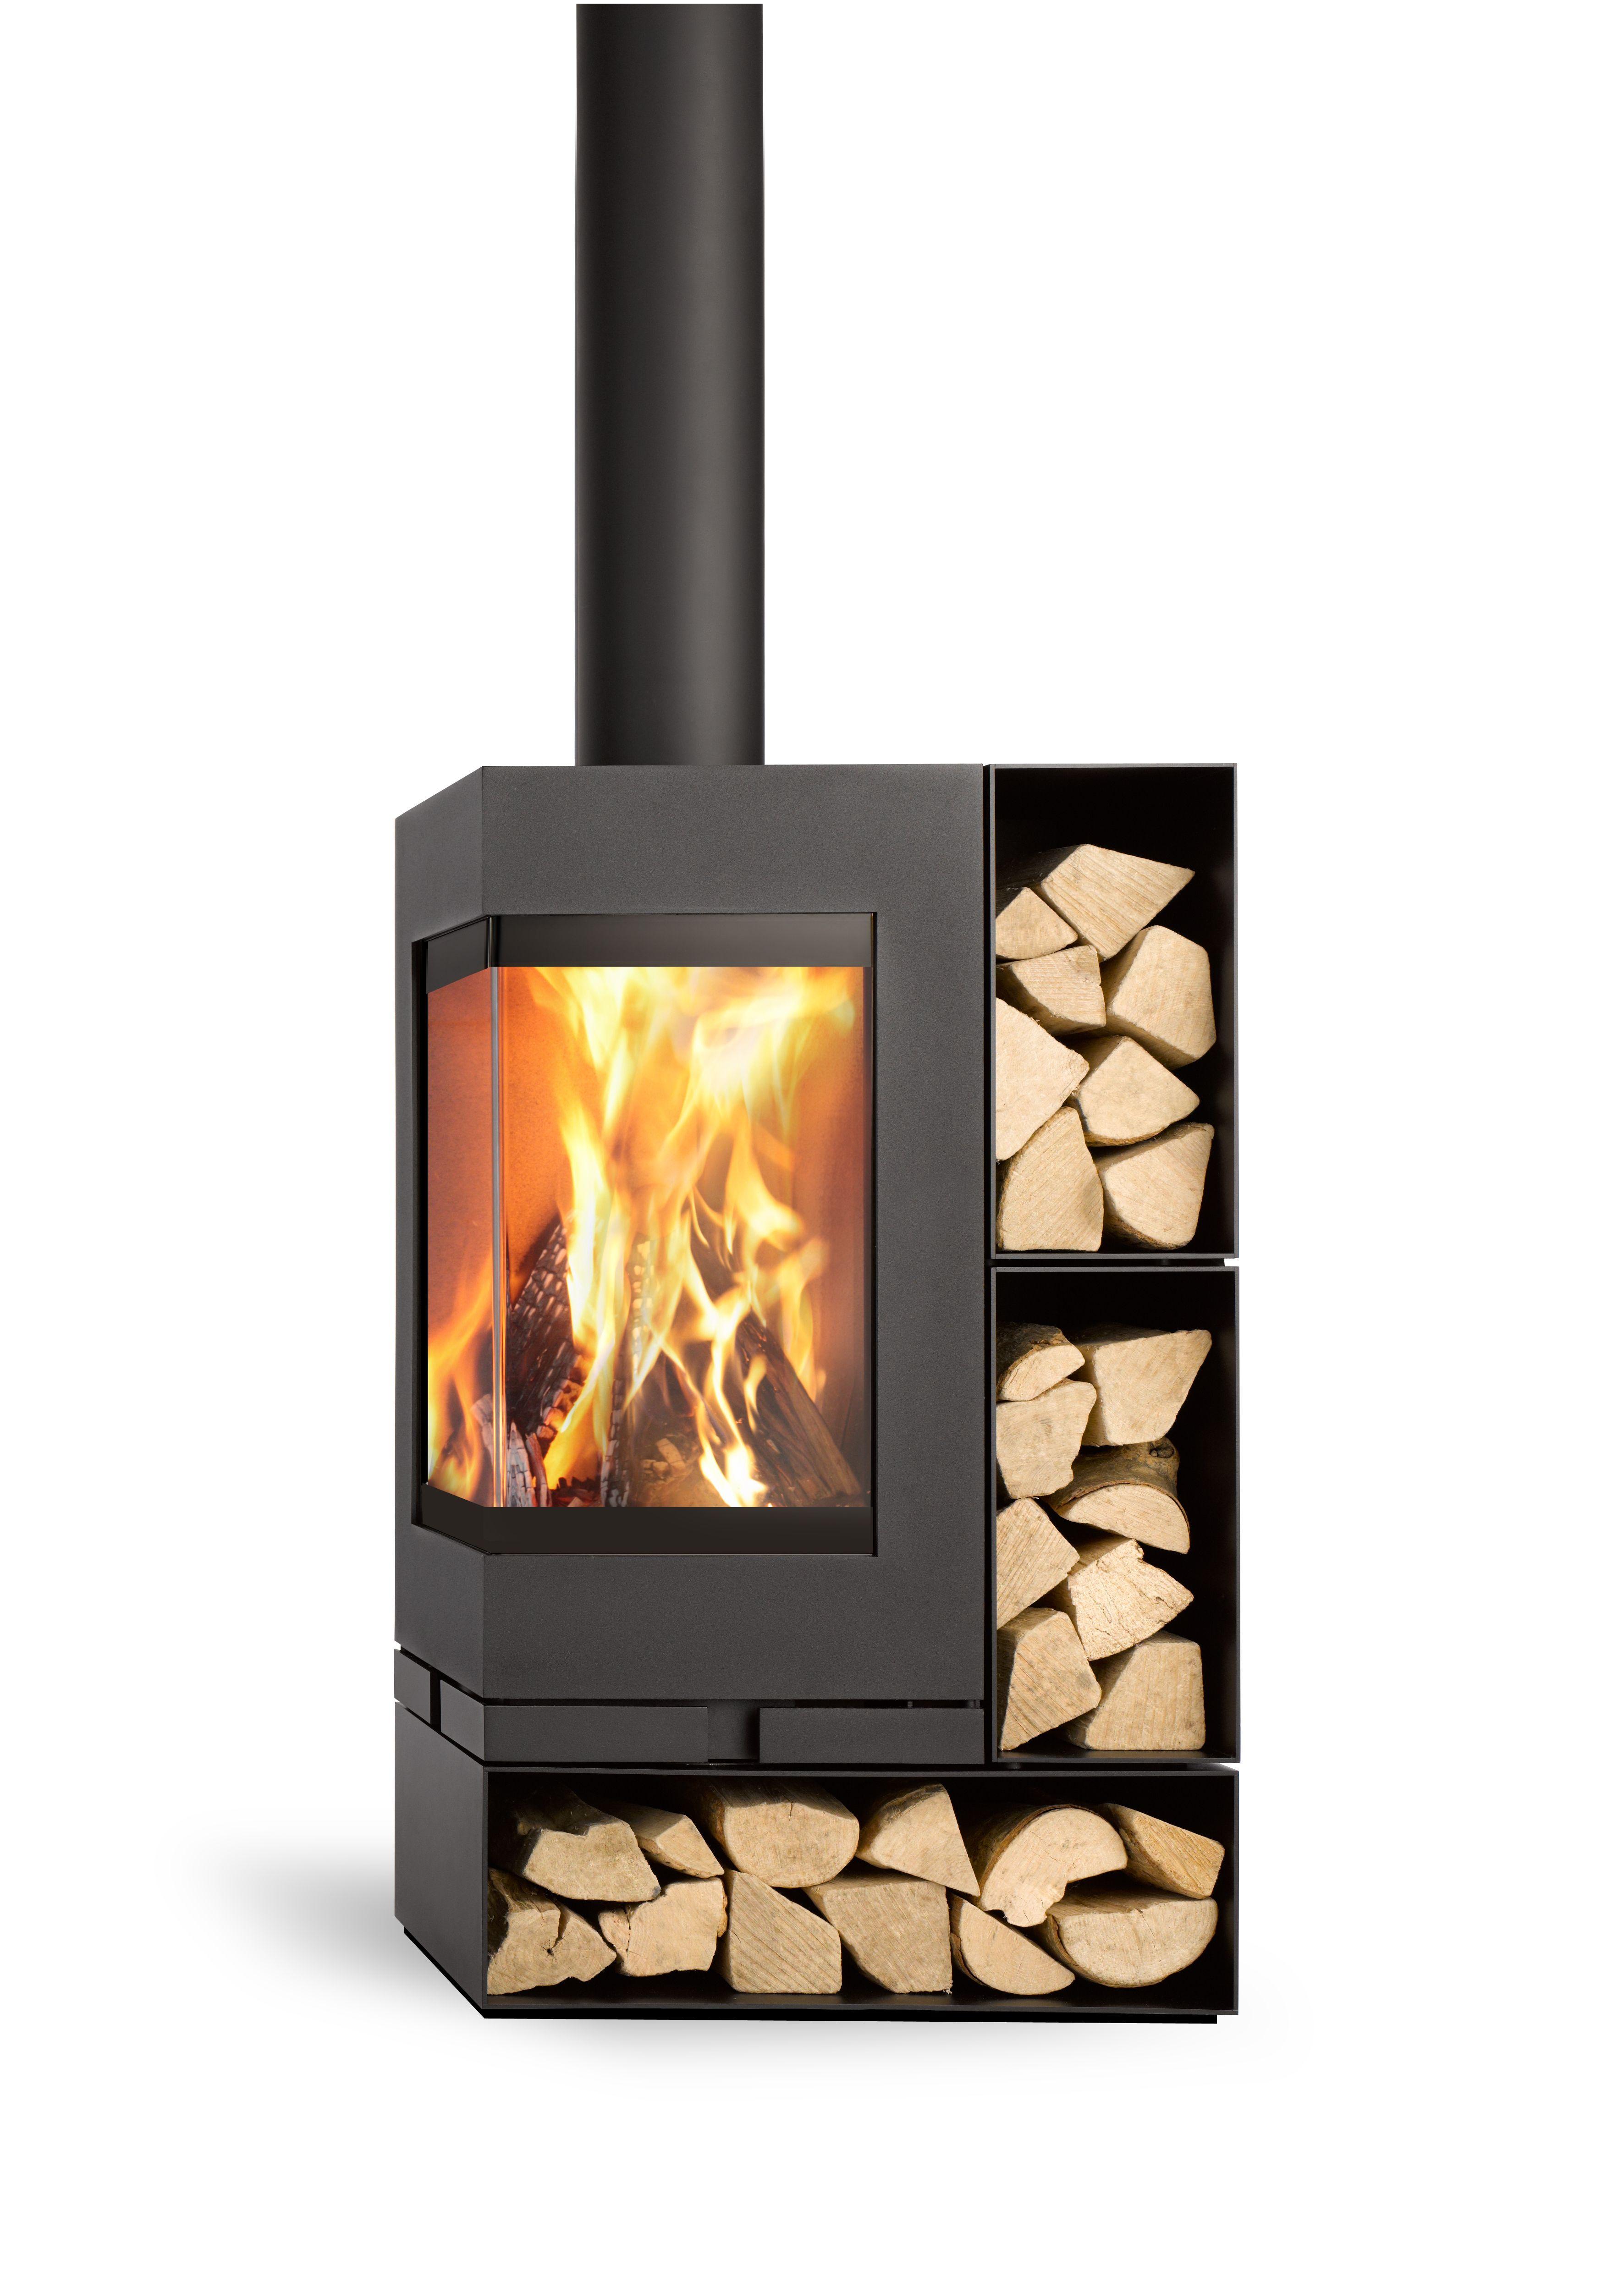 Skatherm Elements Freestanding And Modular Fireplace